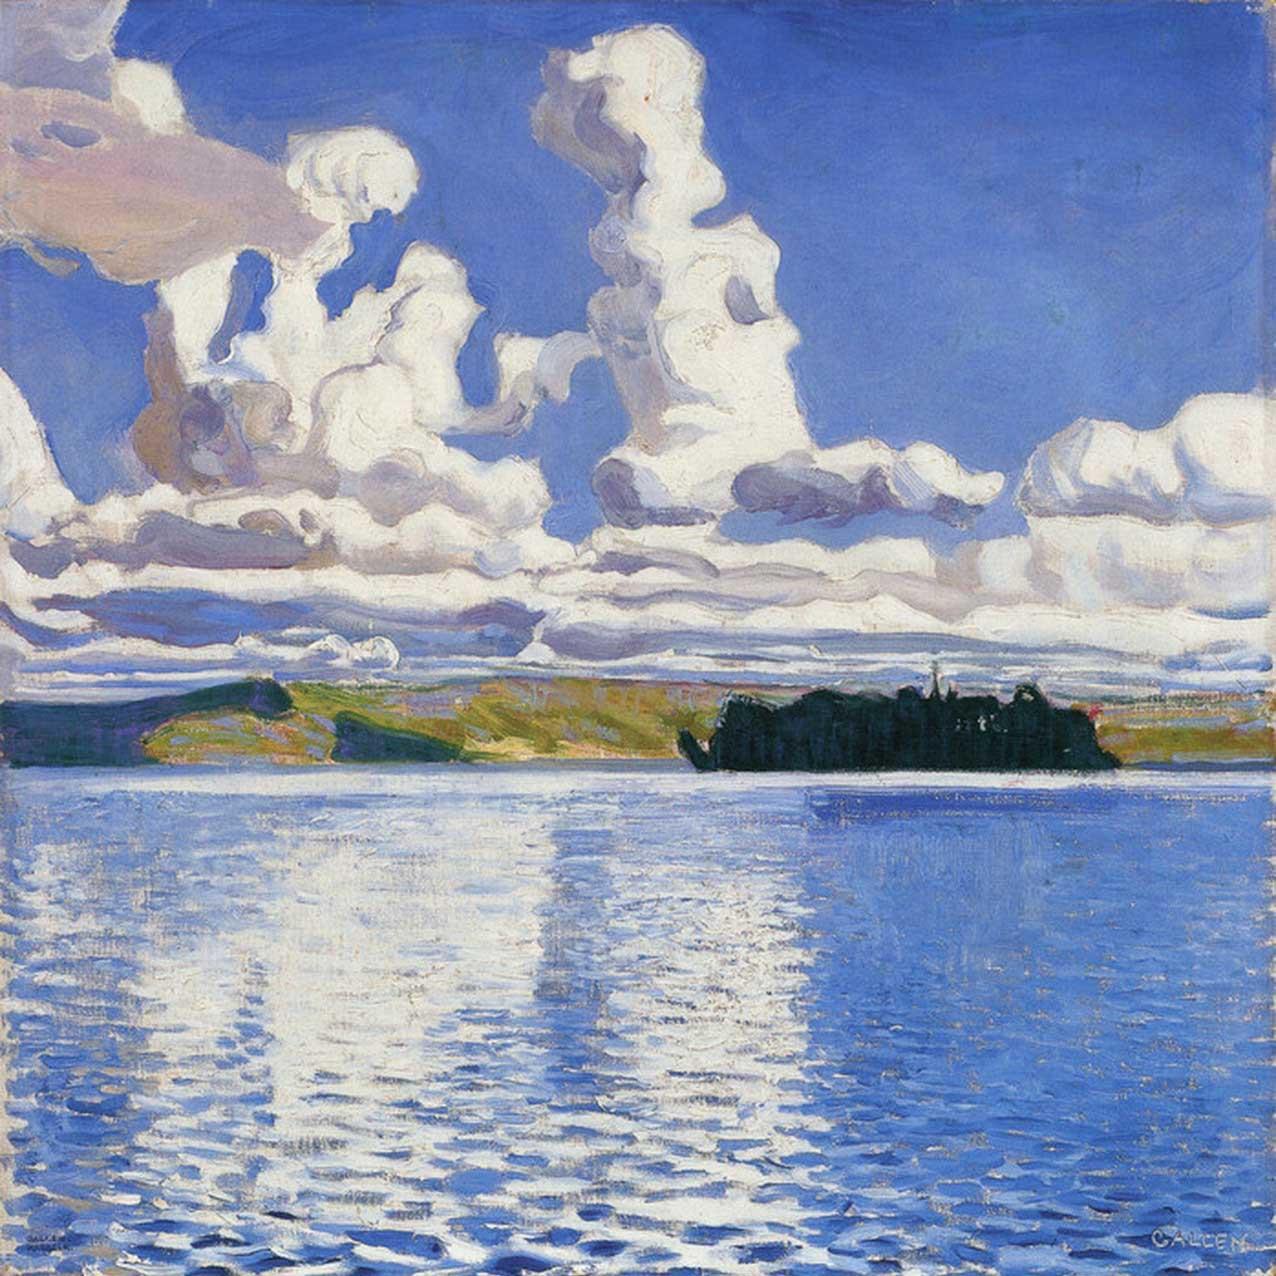 Akseli Gallen-Kallela Art